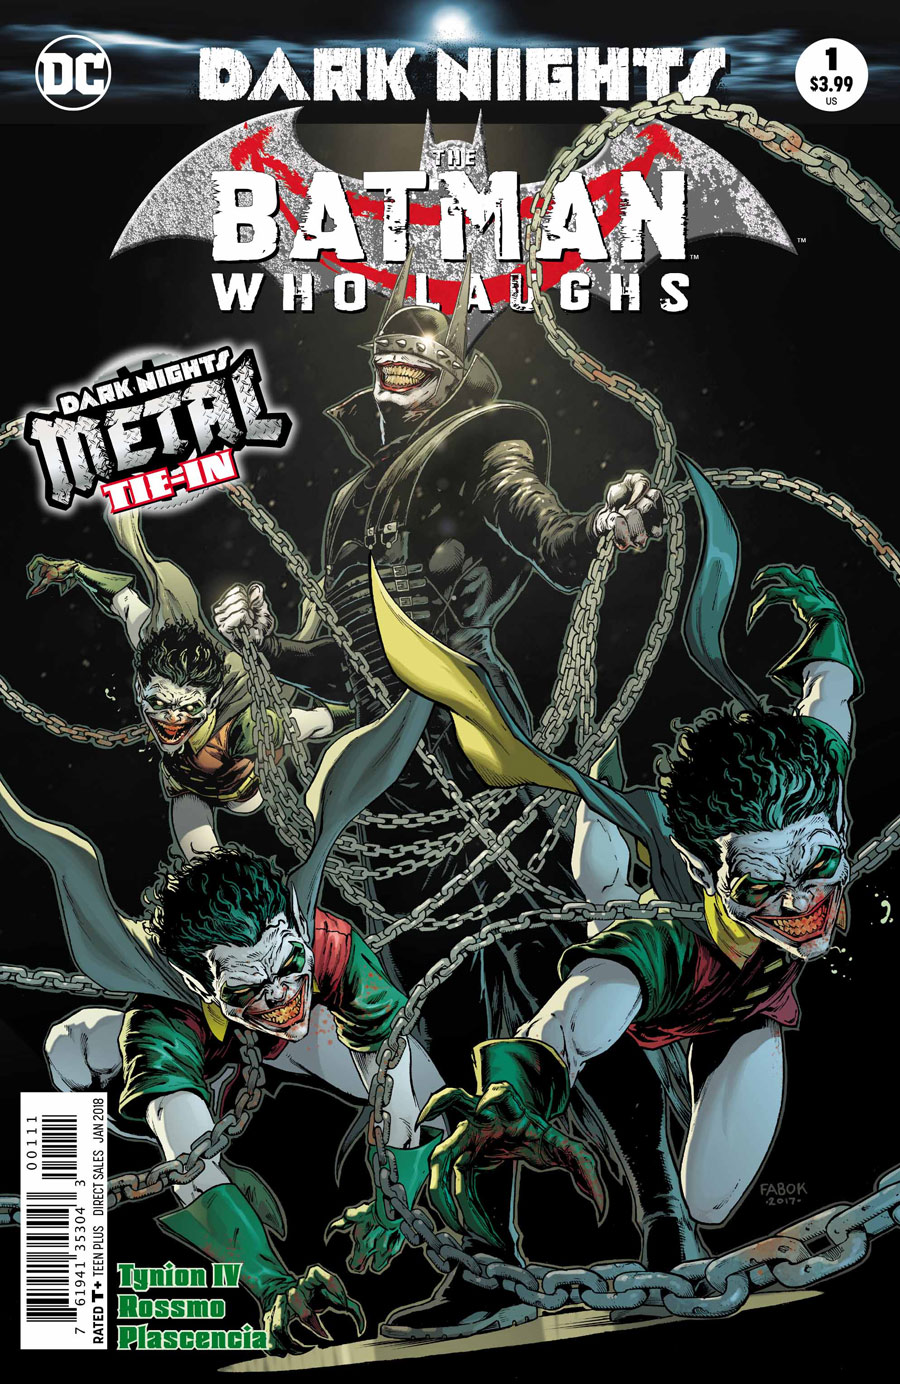 The Batman Who Laughs Cover - DC Comics News